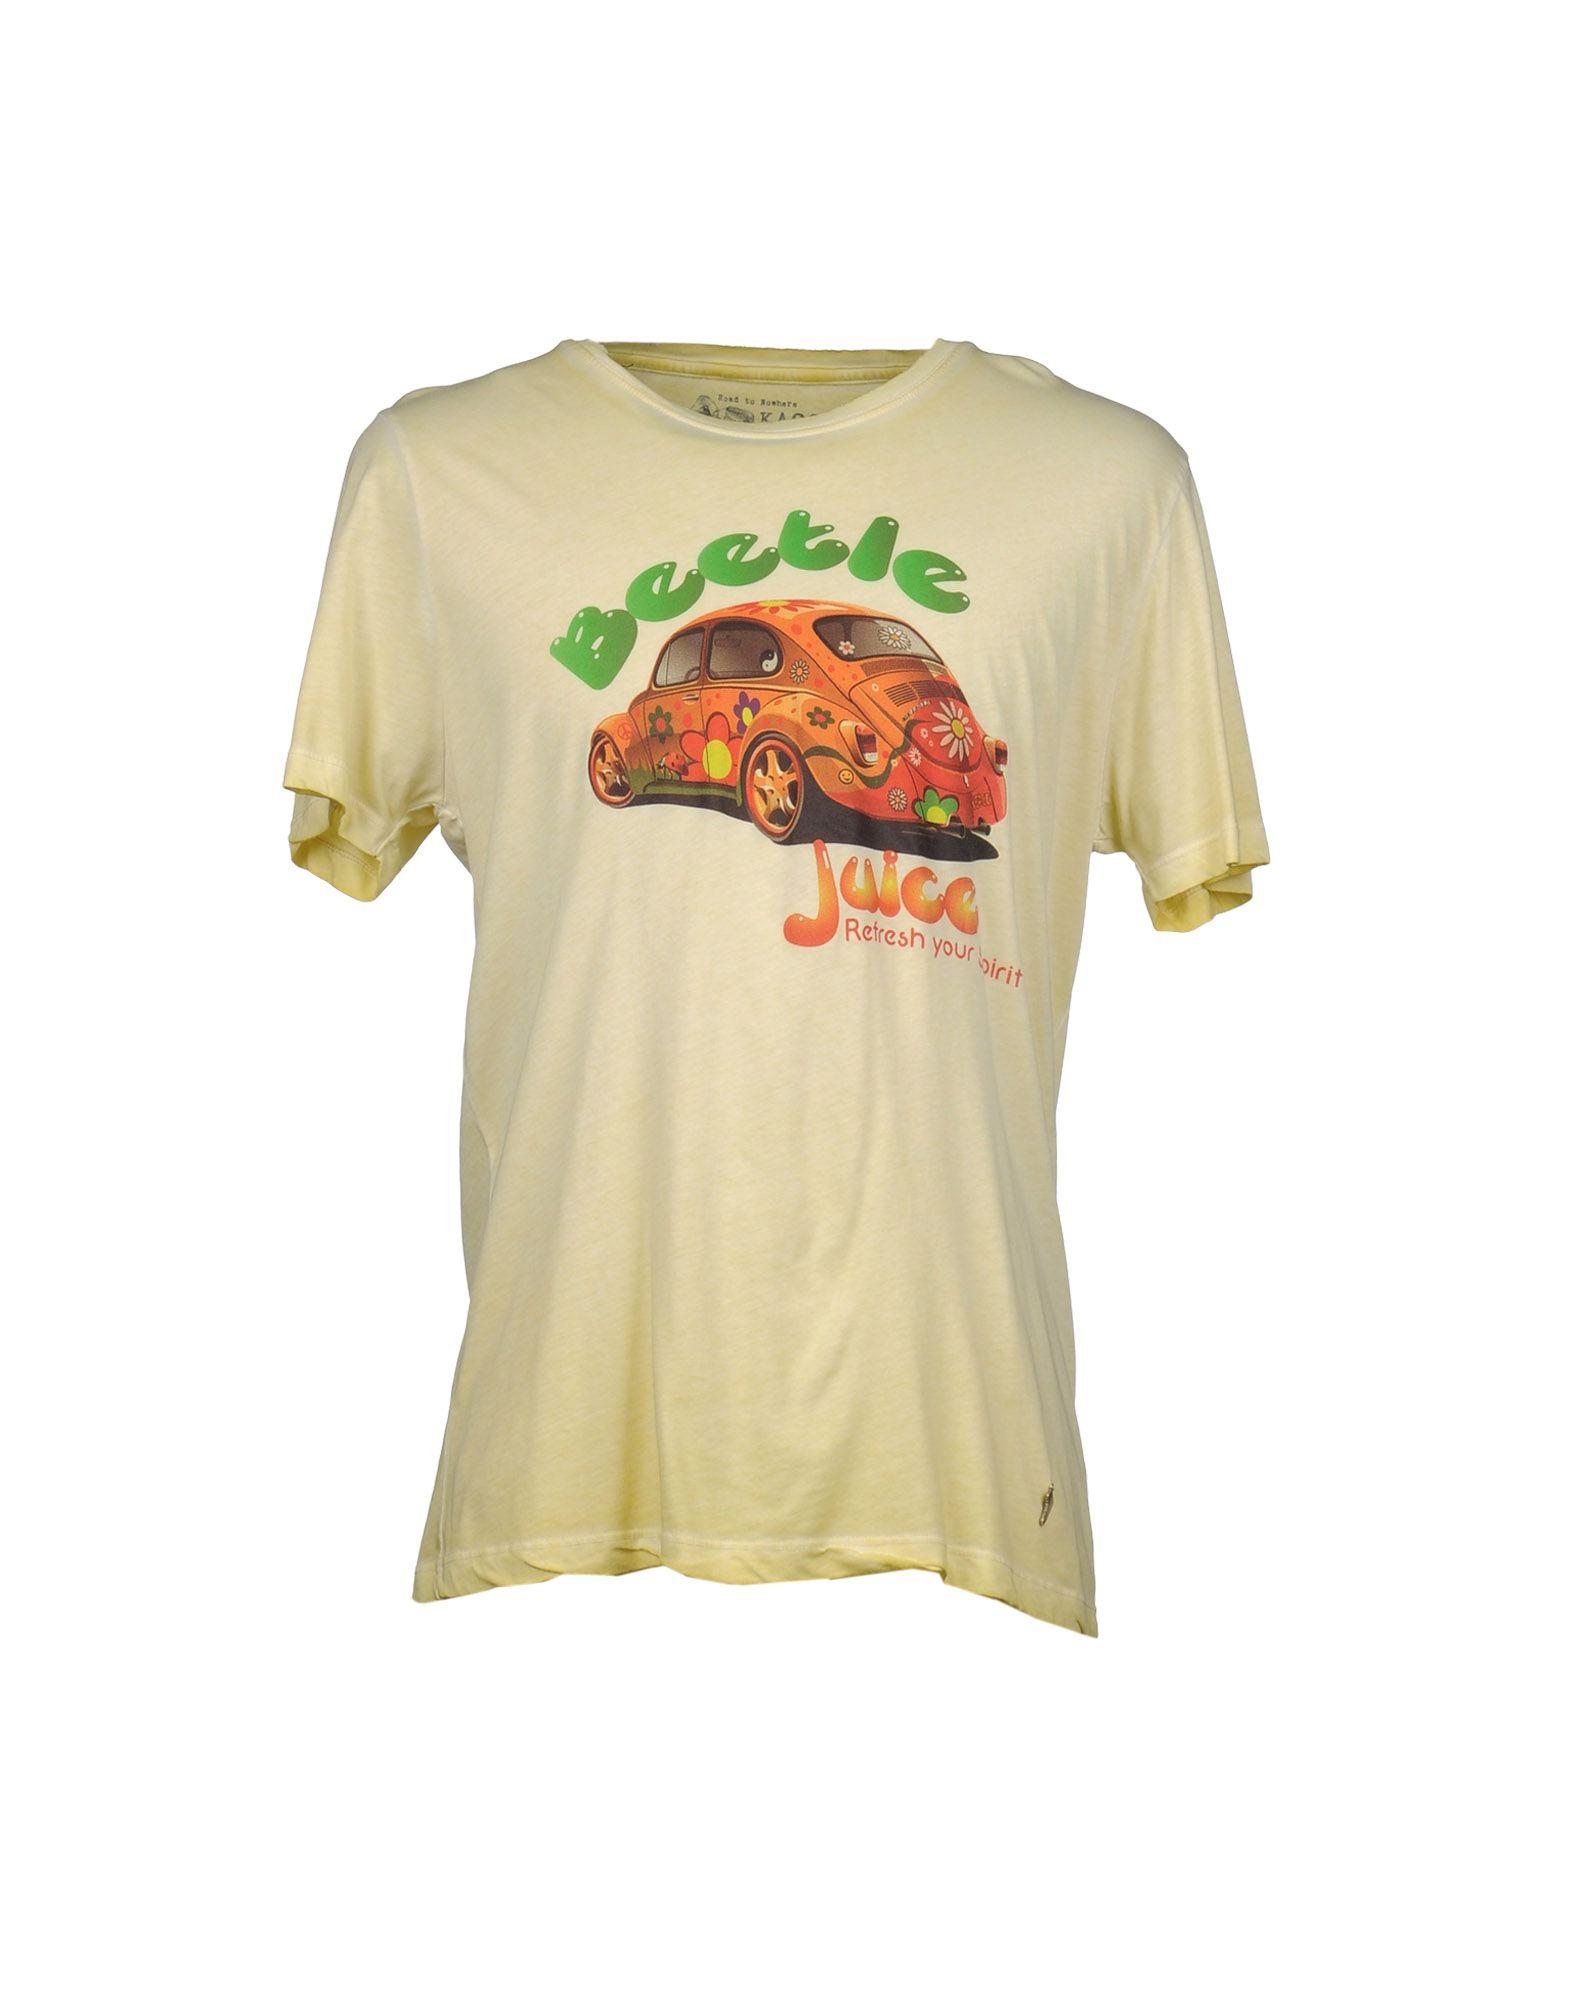 KAOS Футболка с короткими рукавами футболка поло большого размера с короткими рукавами